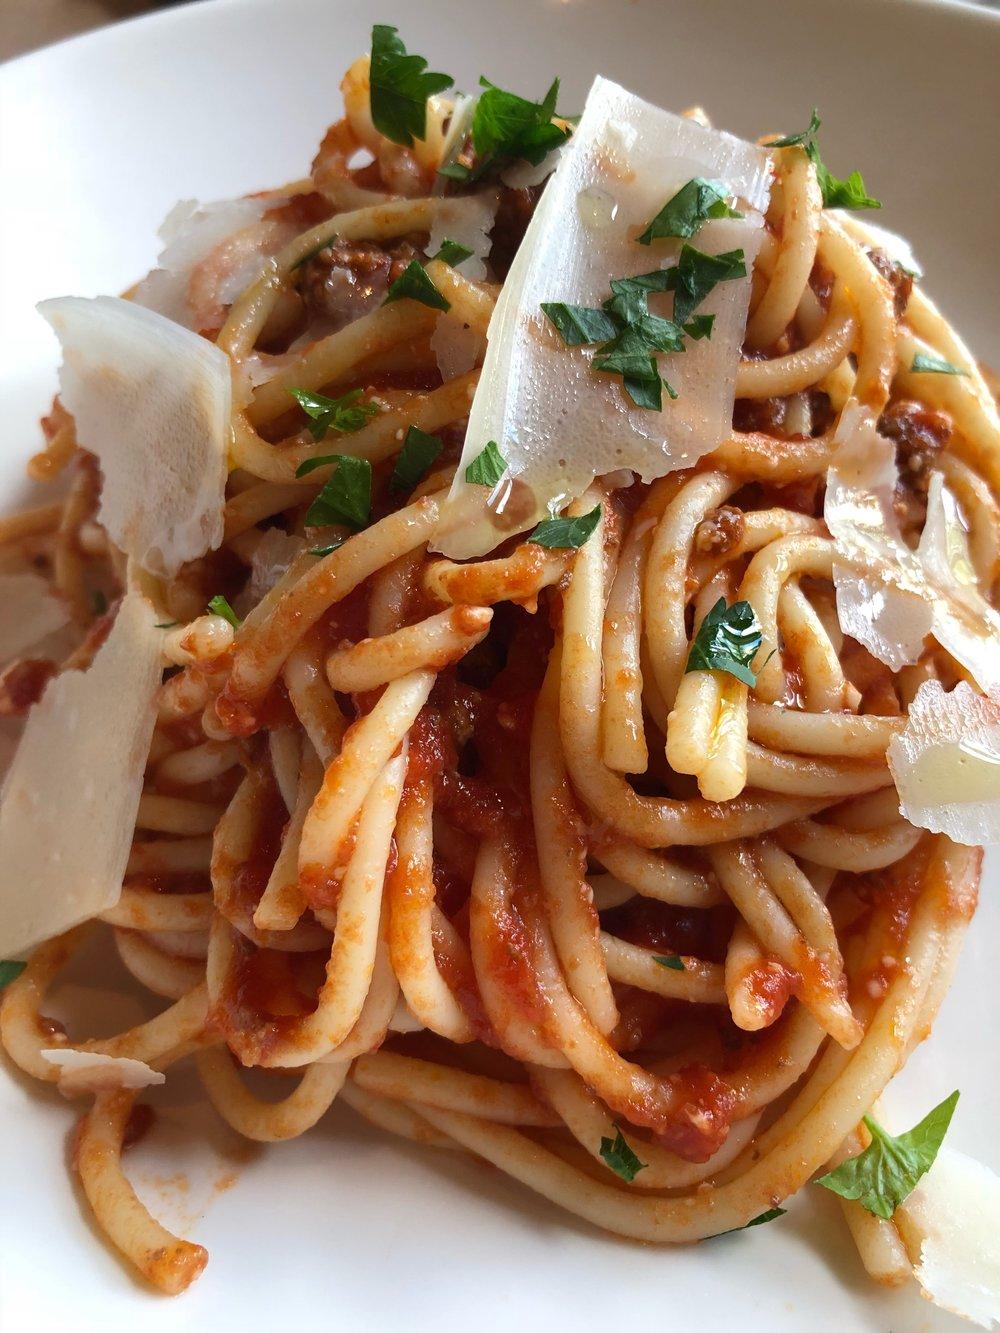 Bolognese - with spaghetti (sub for rigatoni)